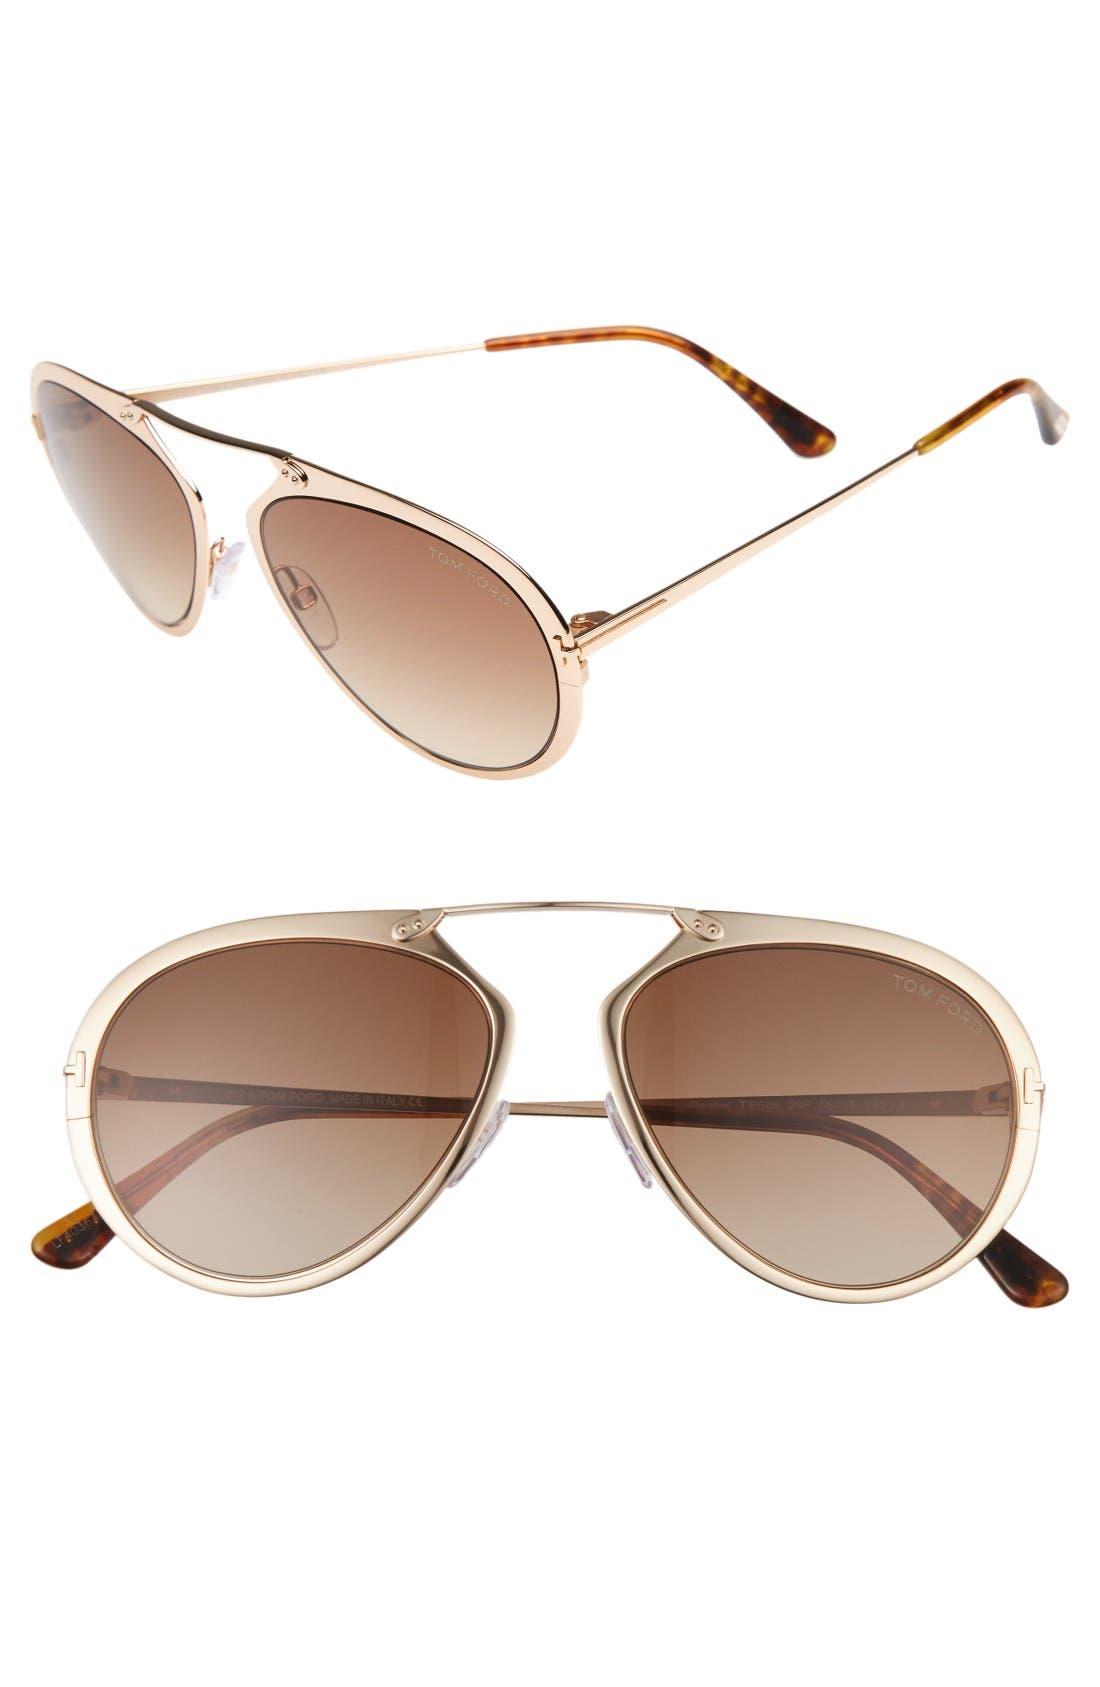 Main Image - Tom Ford Dashel 55mm Sunglasses